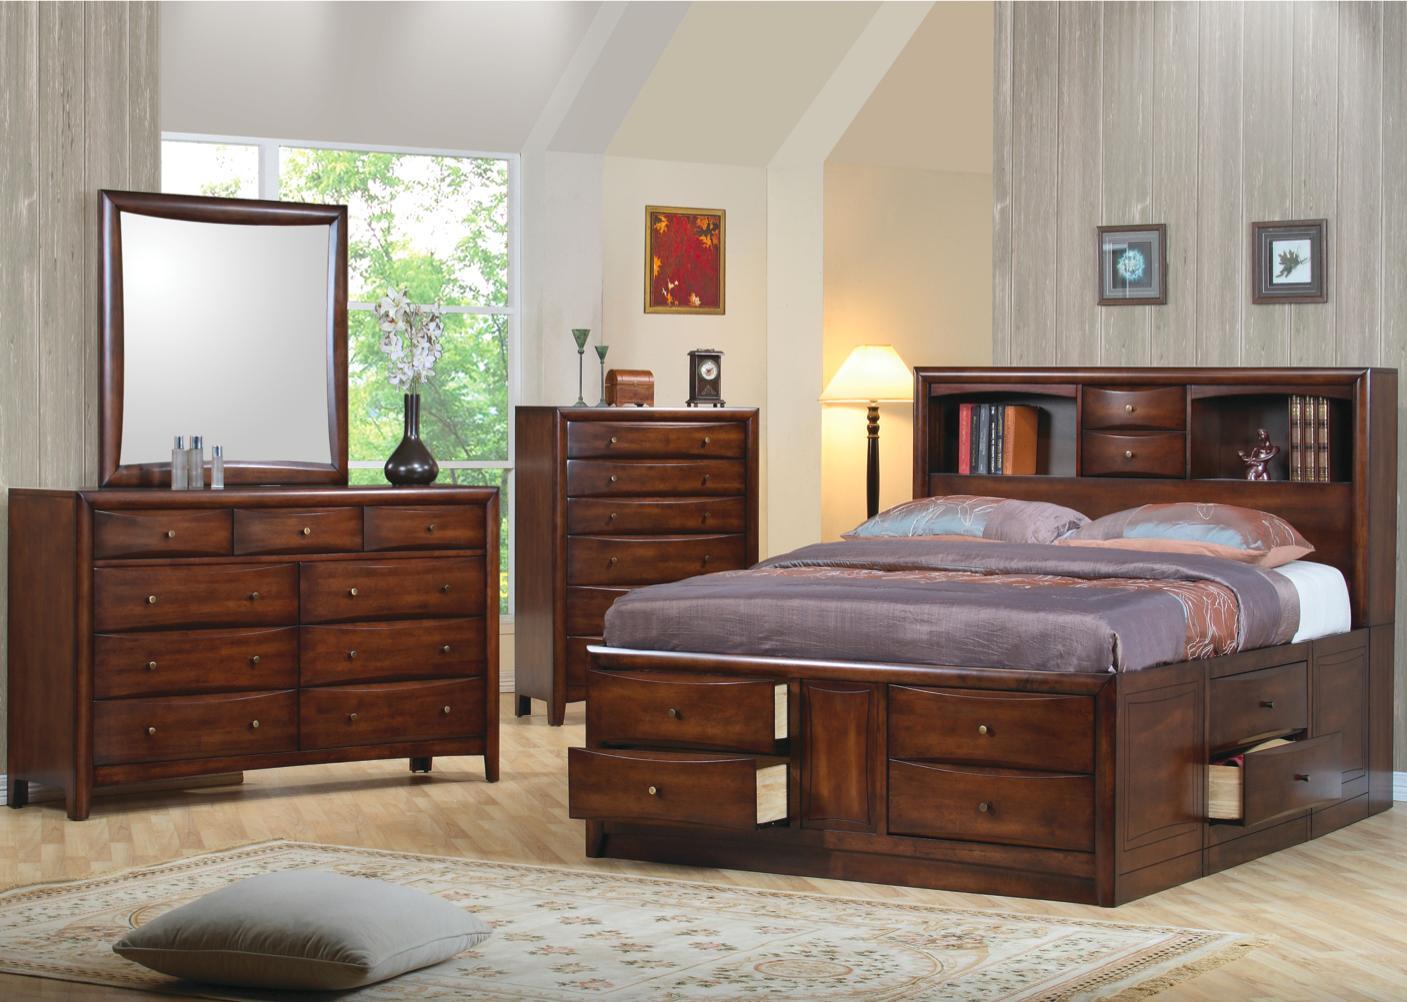 Coaster Furniture - Hillary and Scottsdale Bedroom Sets